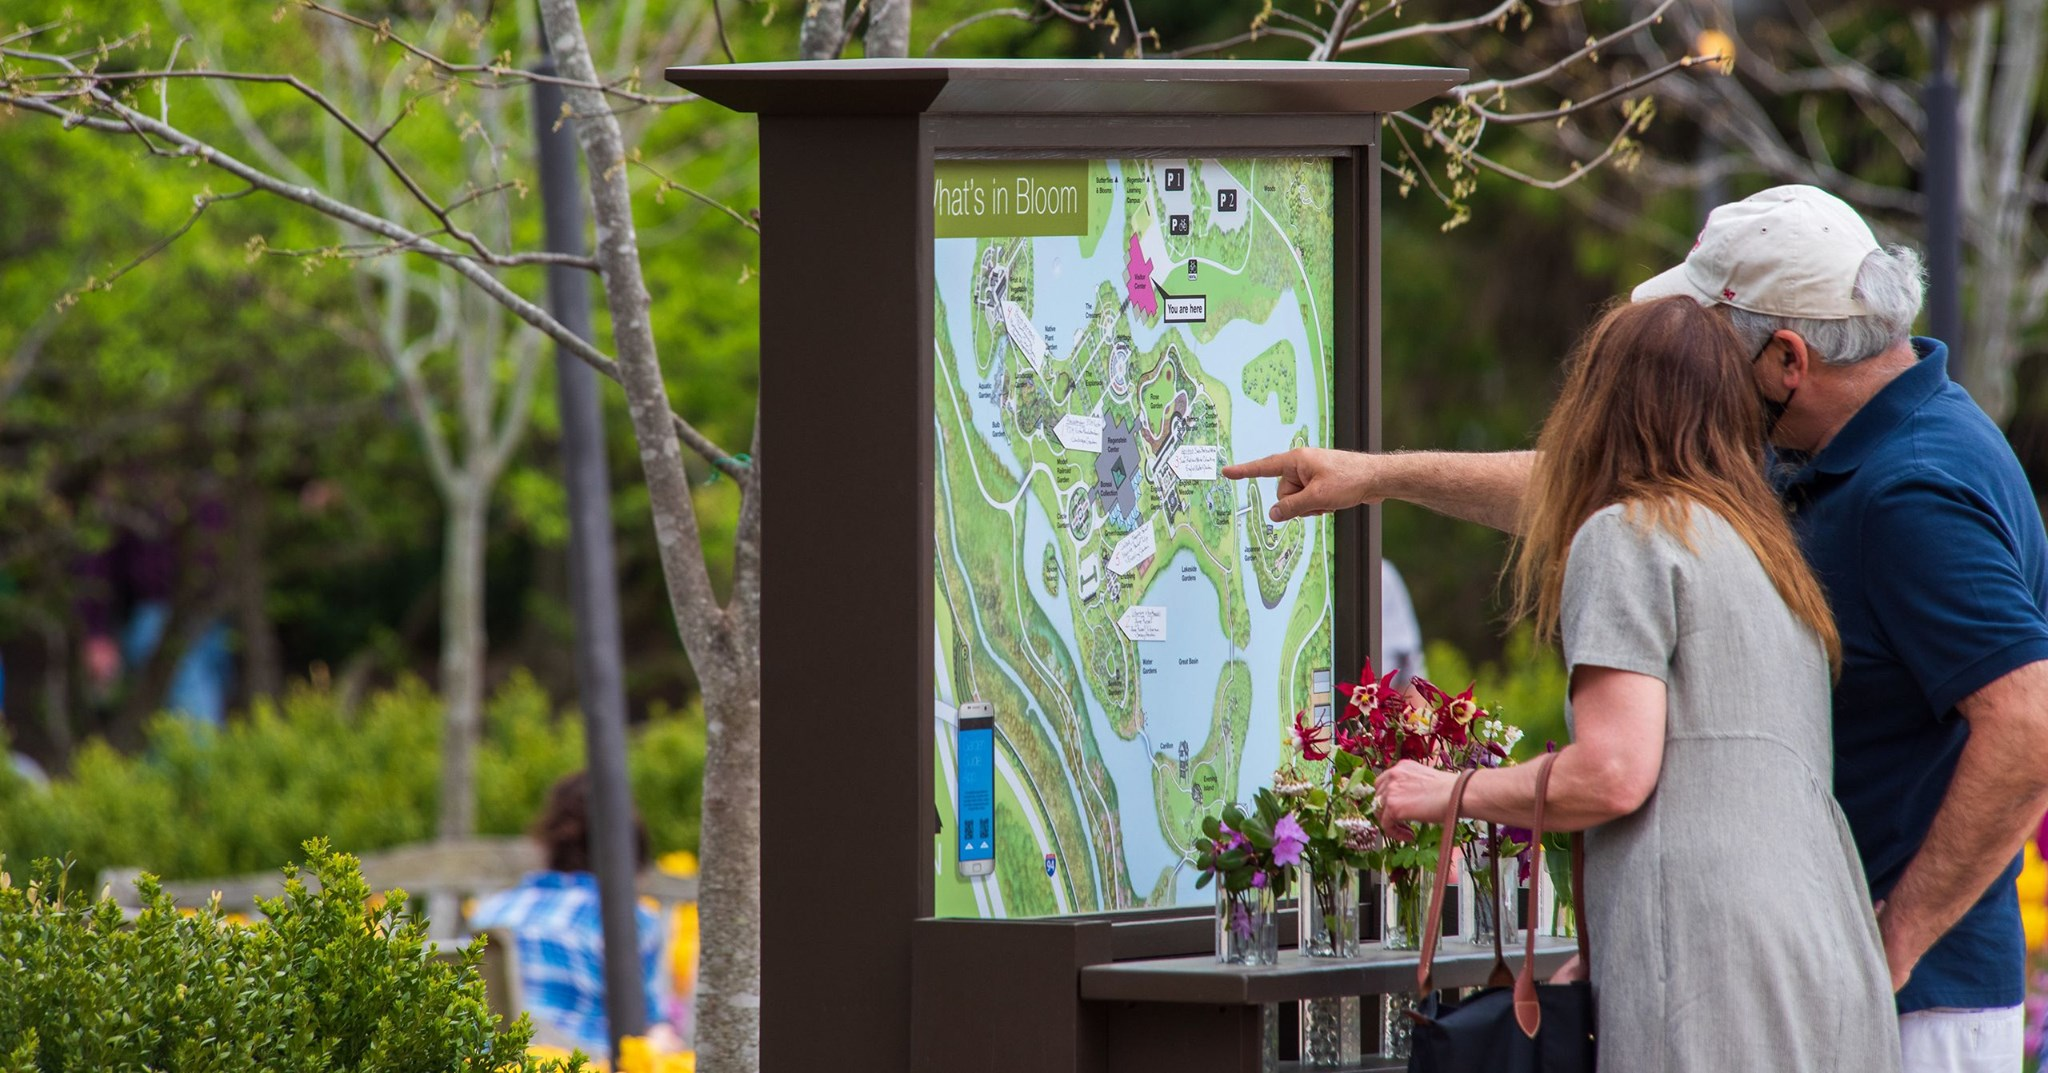 Chicago Botanic Garden in Glencoe